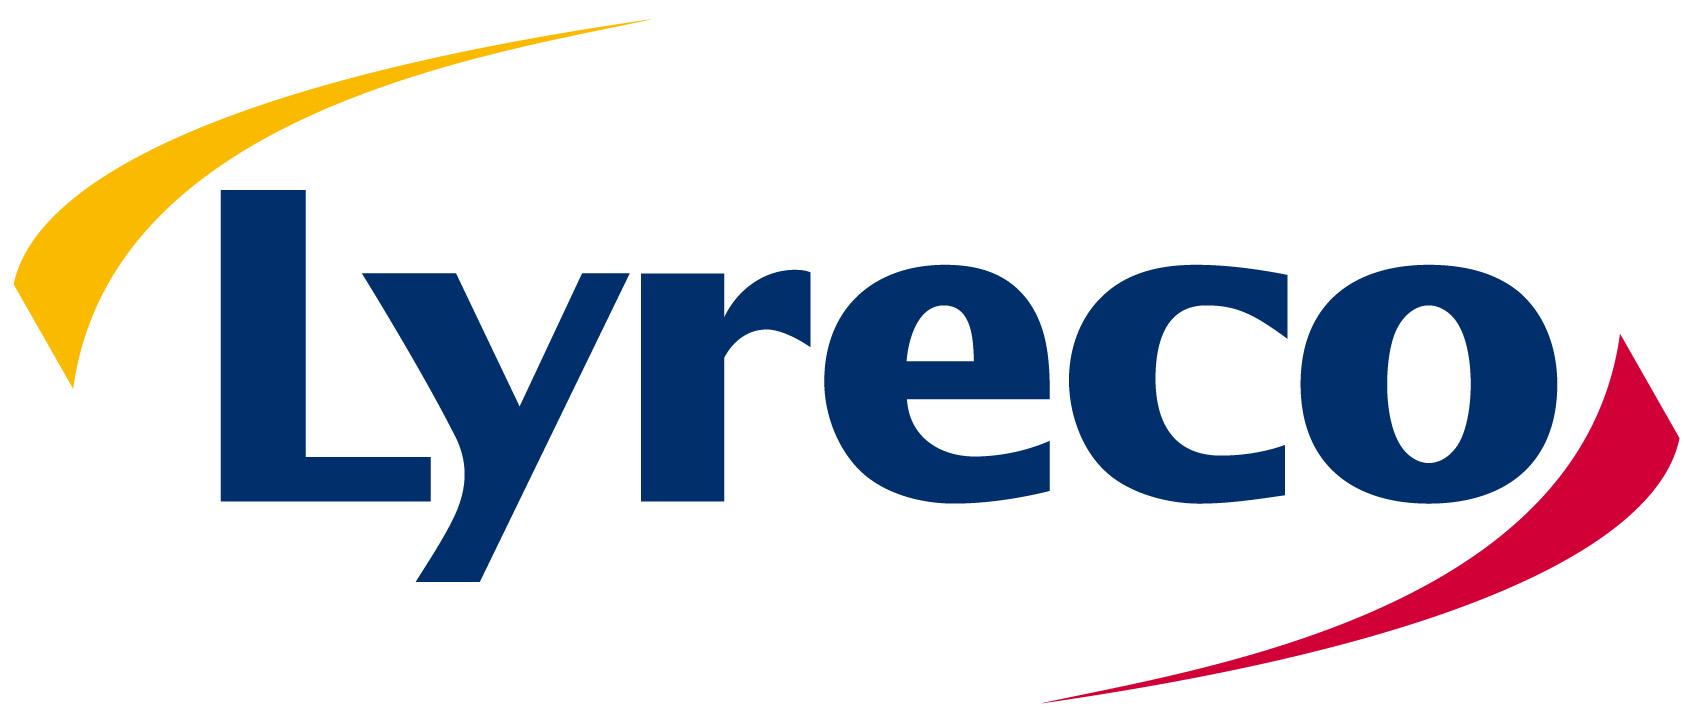 lyreco_logo.jpg